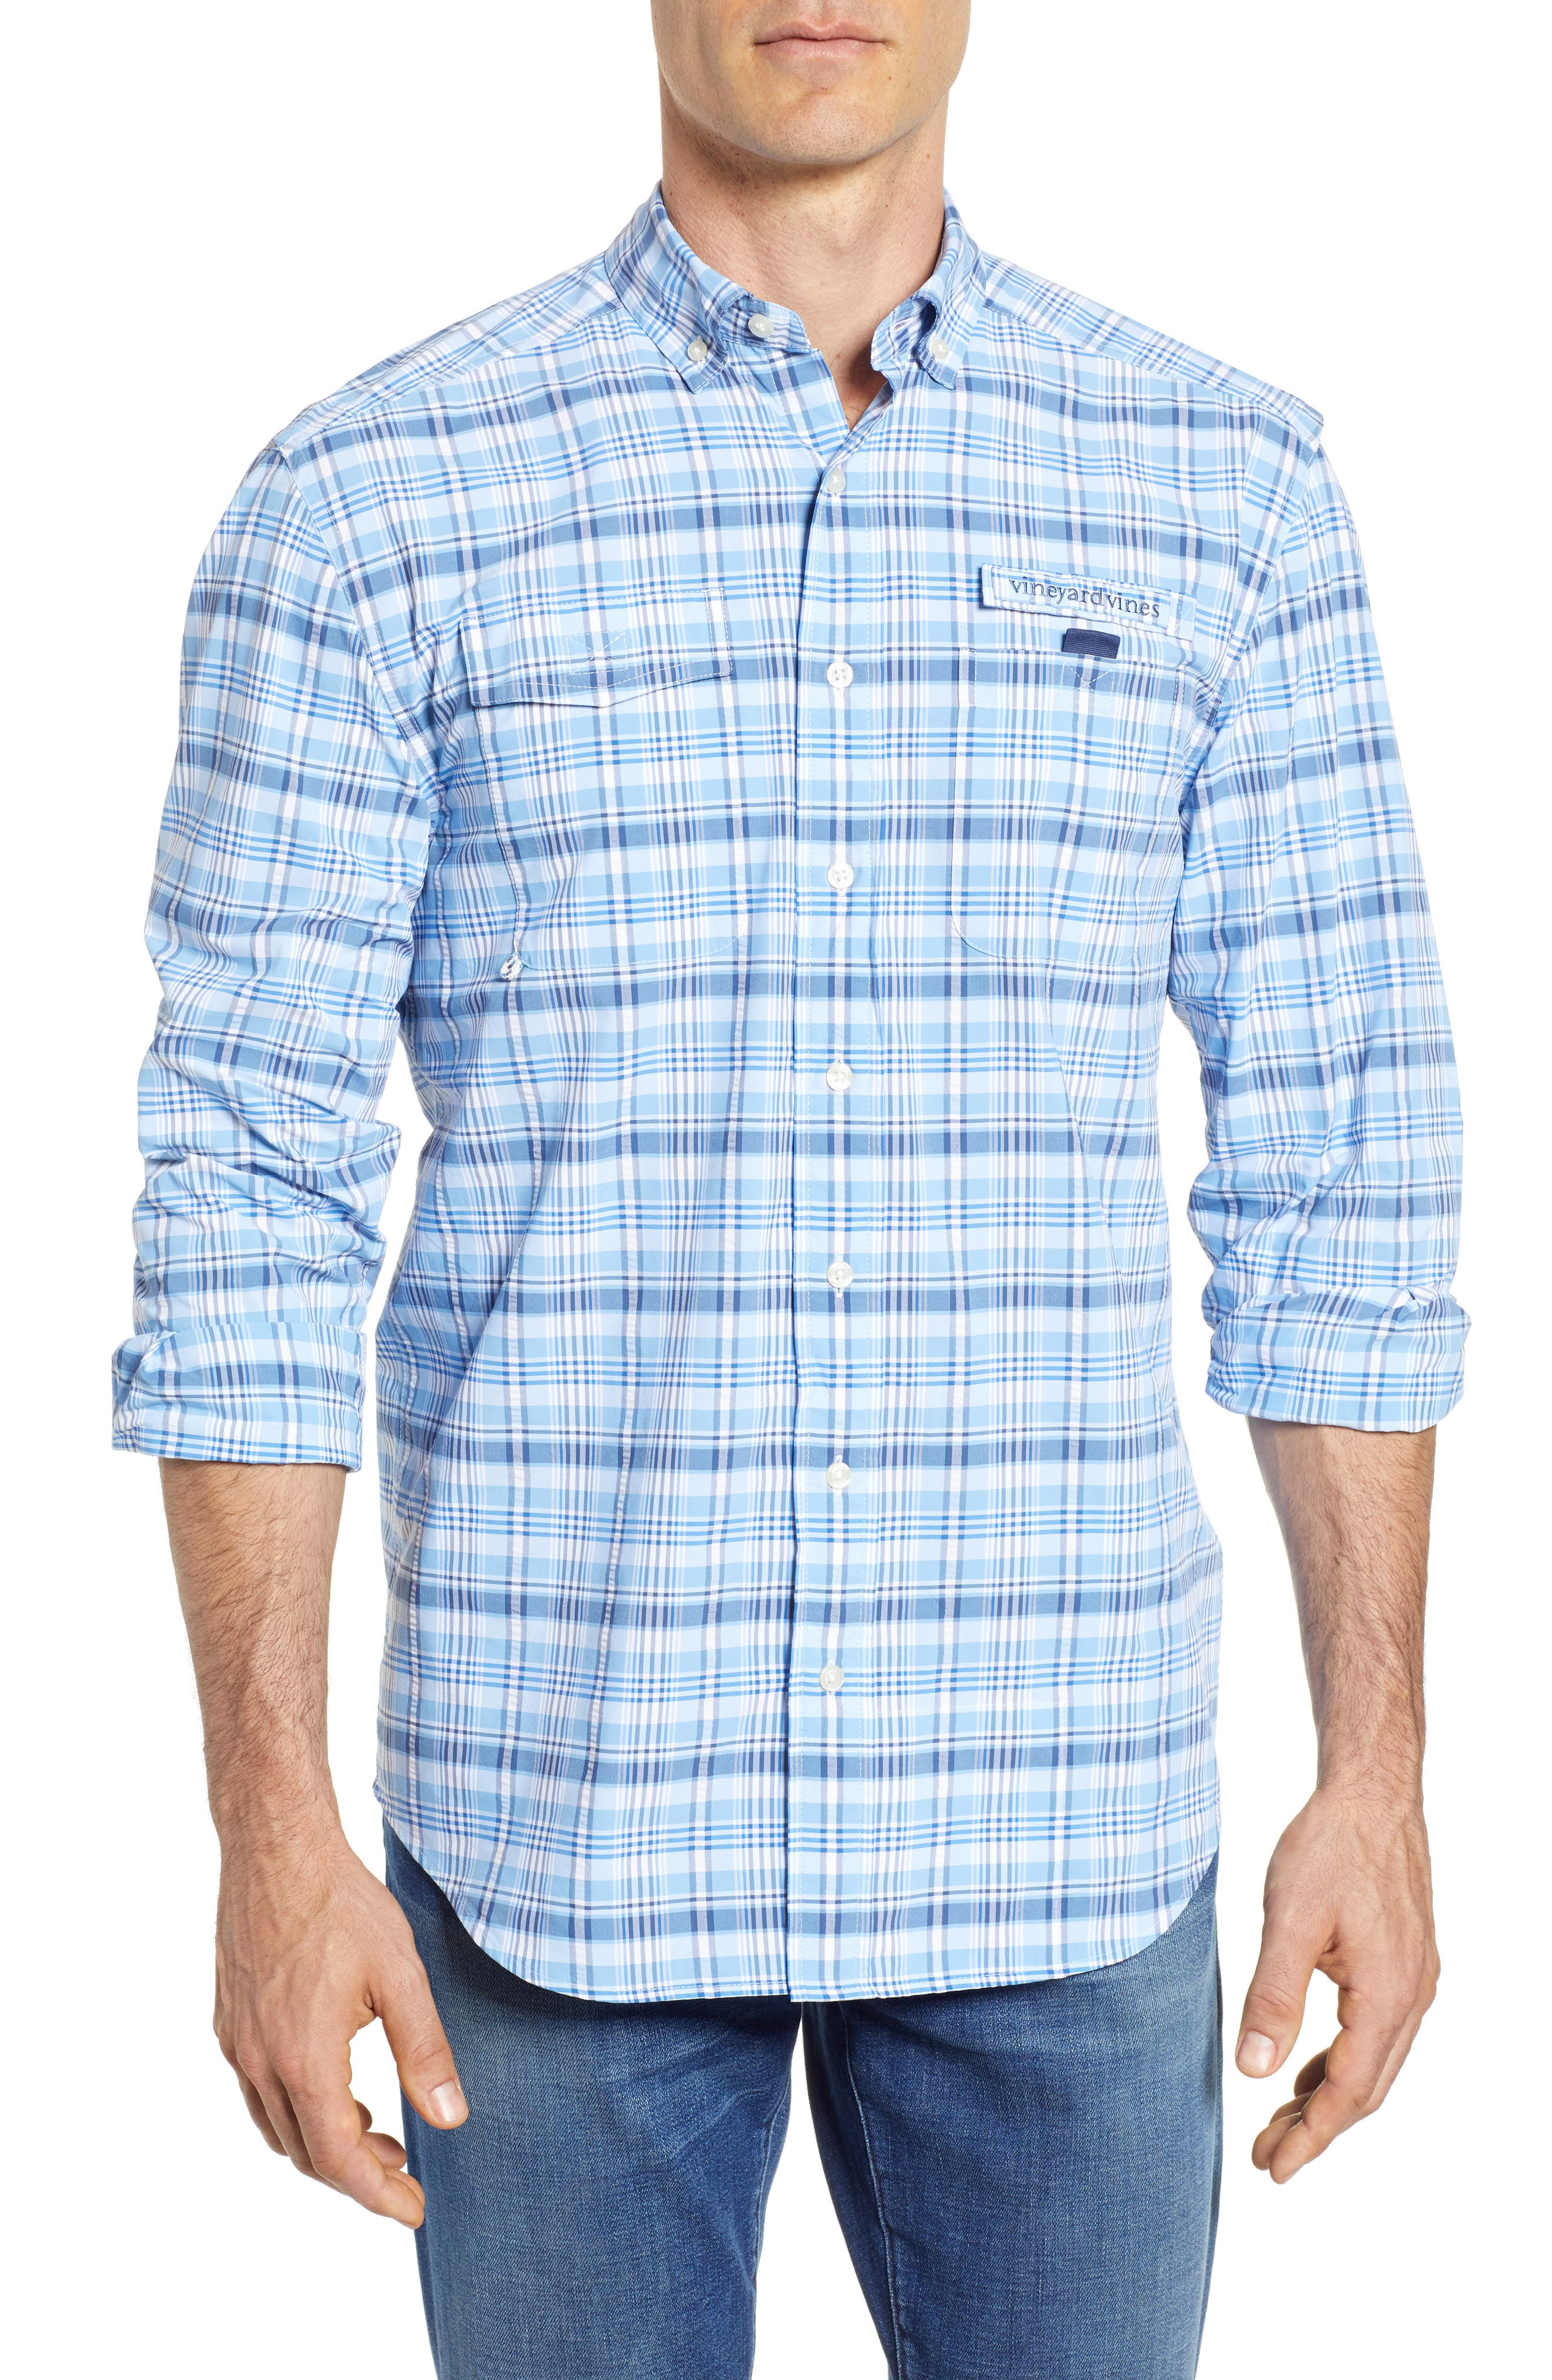 Prospect Hill Harbor Regular Fit Plaid Performance Sport Shirt,                             Main thumbnail 1, color,                             Ocean Breeze